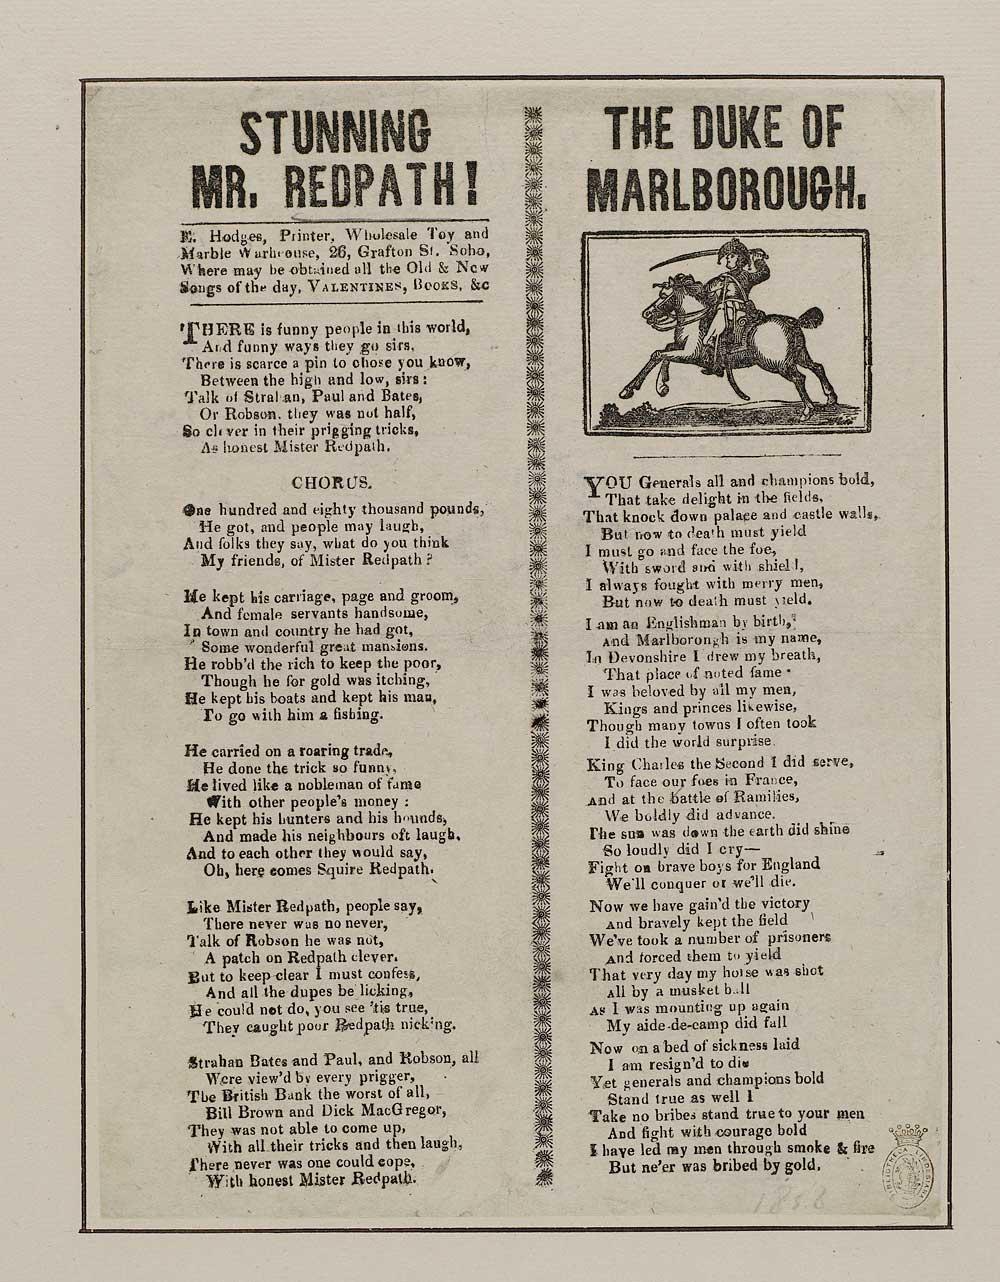 Stunning Mr Redpath - Crime & punishment - English ballads